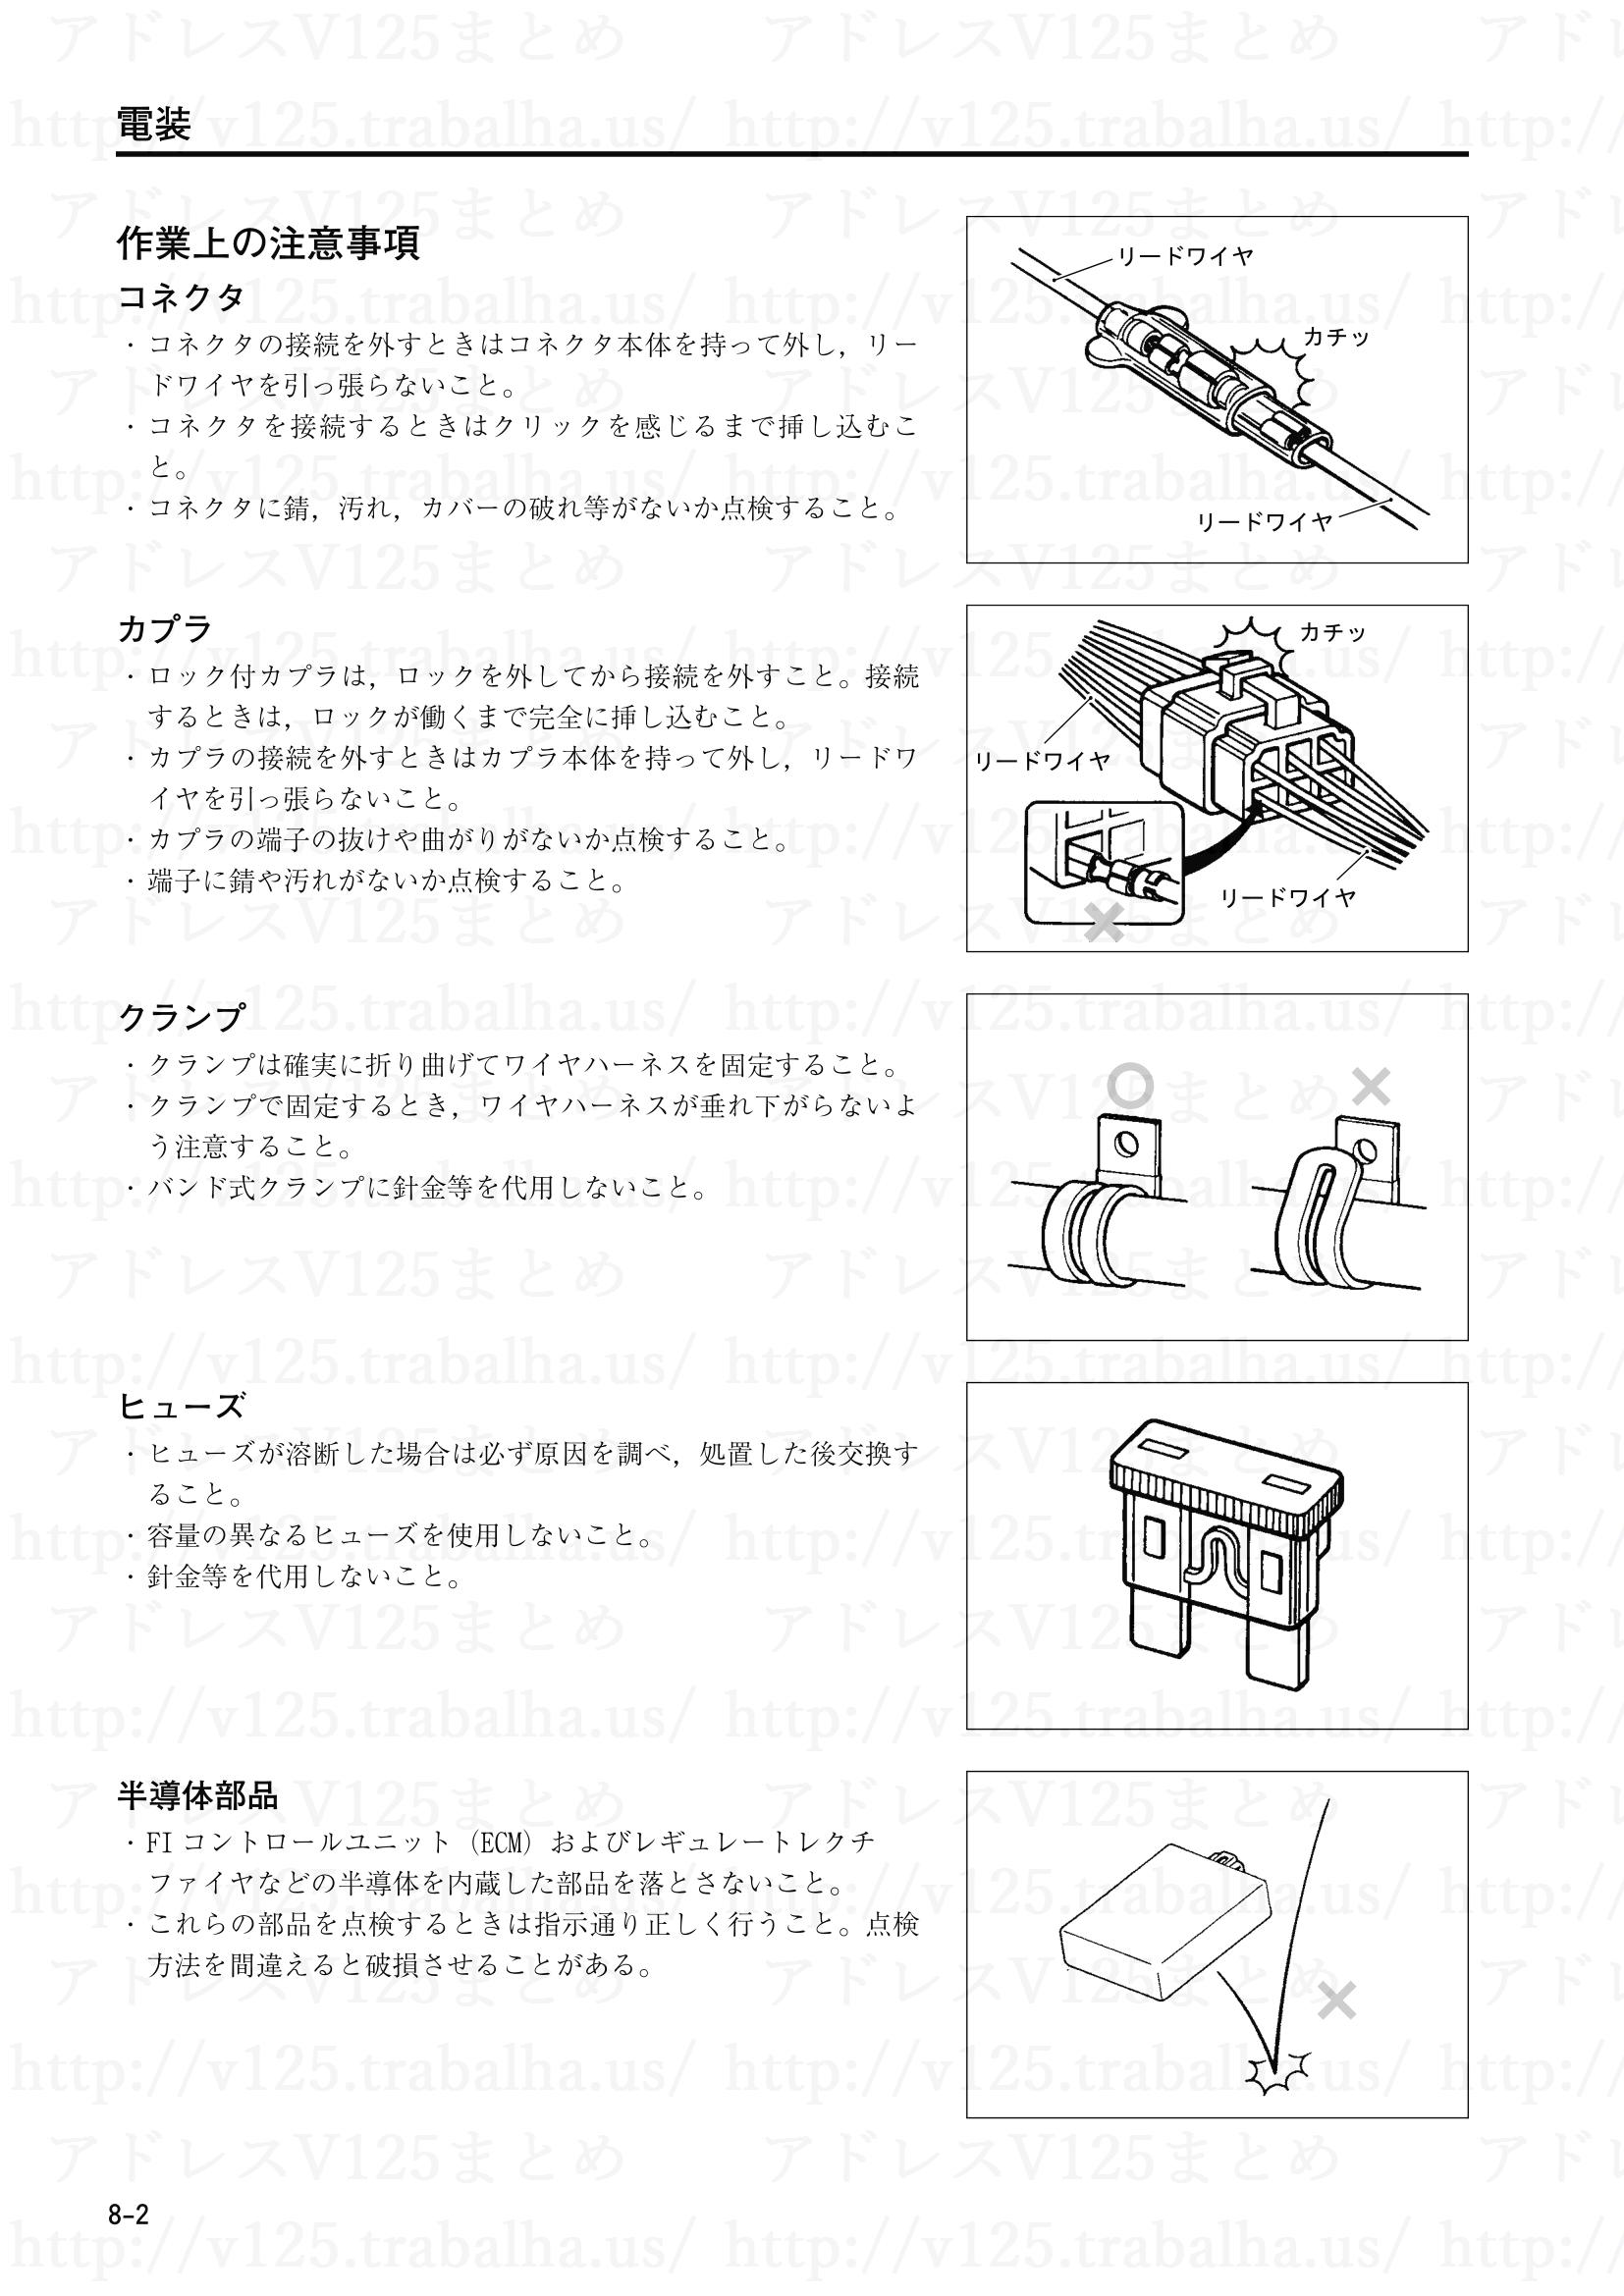 8-2【電装】作業上の注意事項